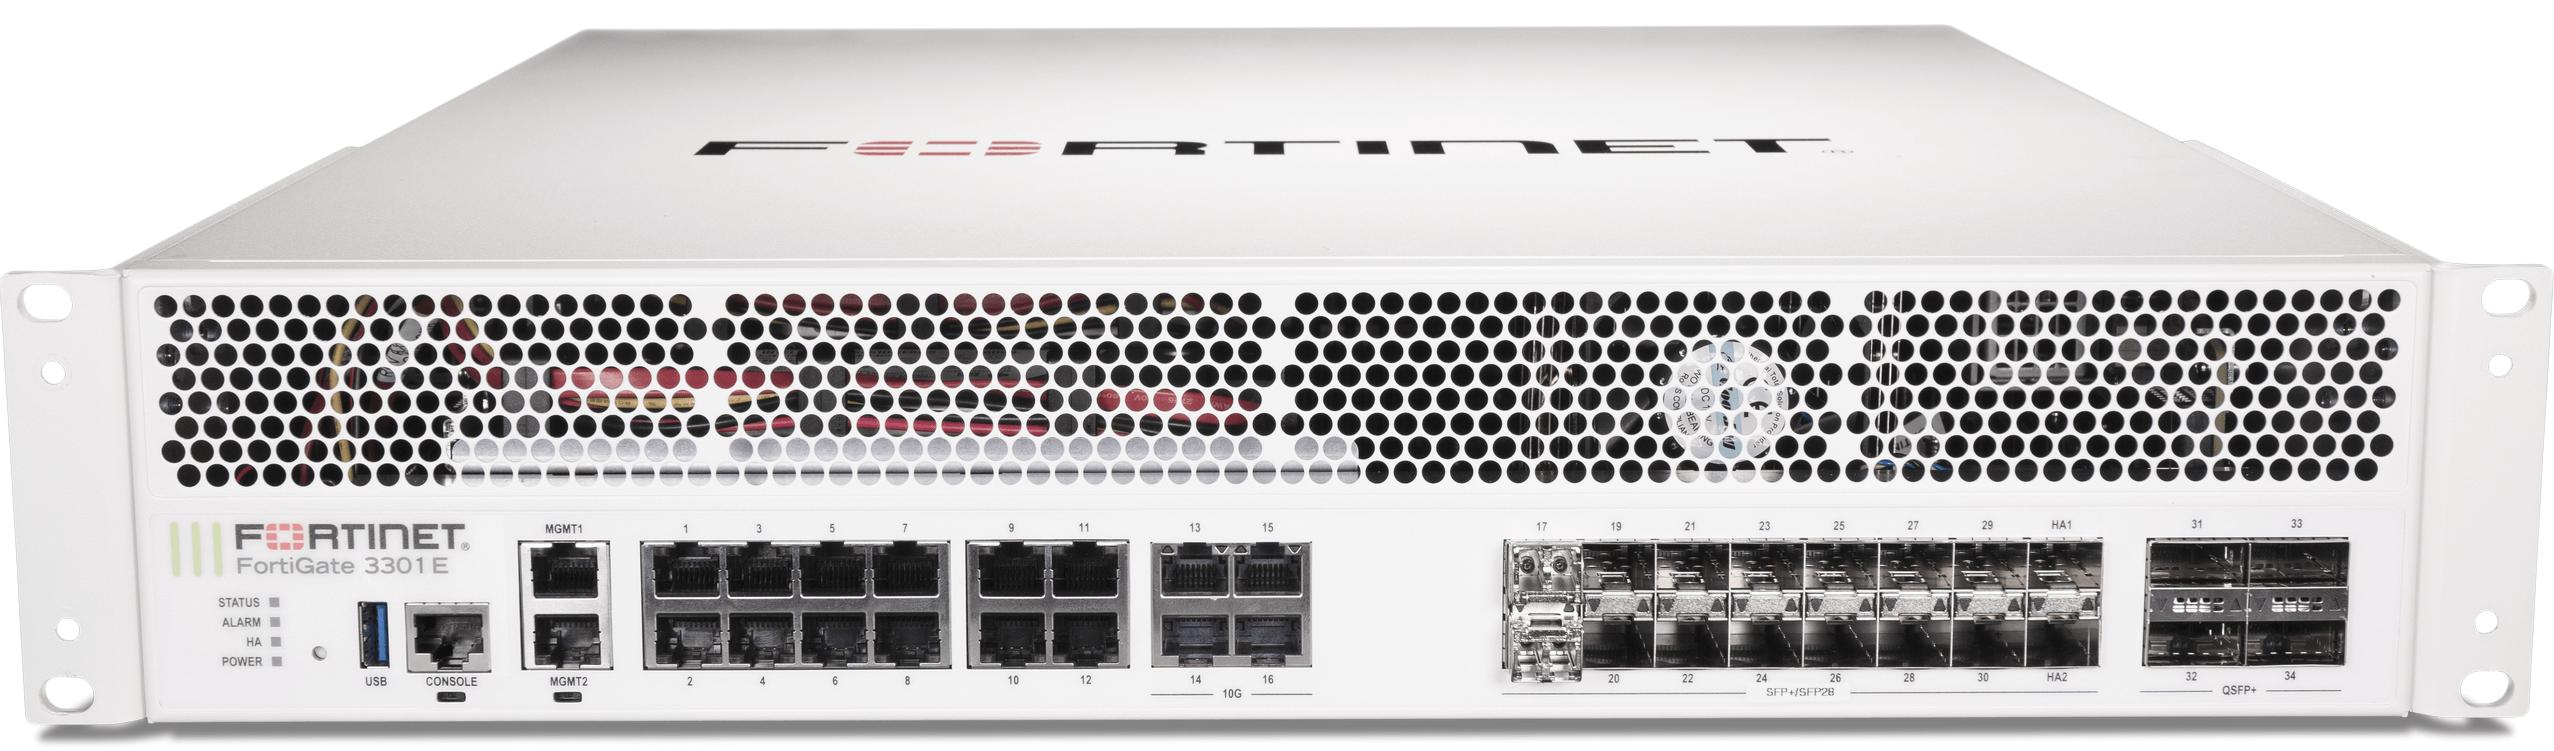 Fortinet FortiGate-3301E - Enterprise Bundle (Hardware + Lizenz)